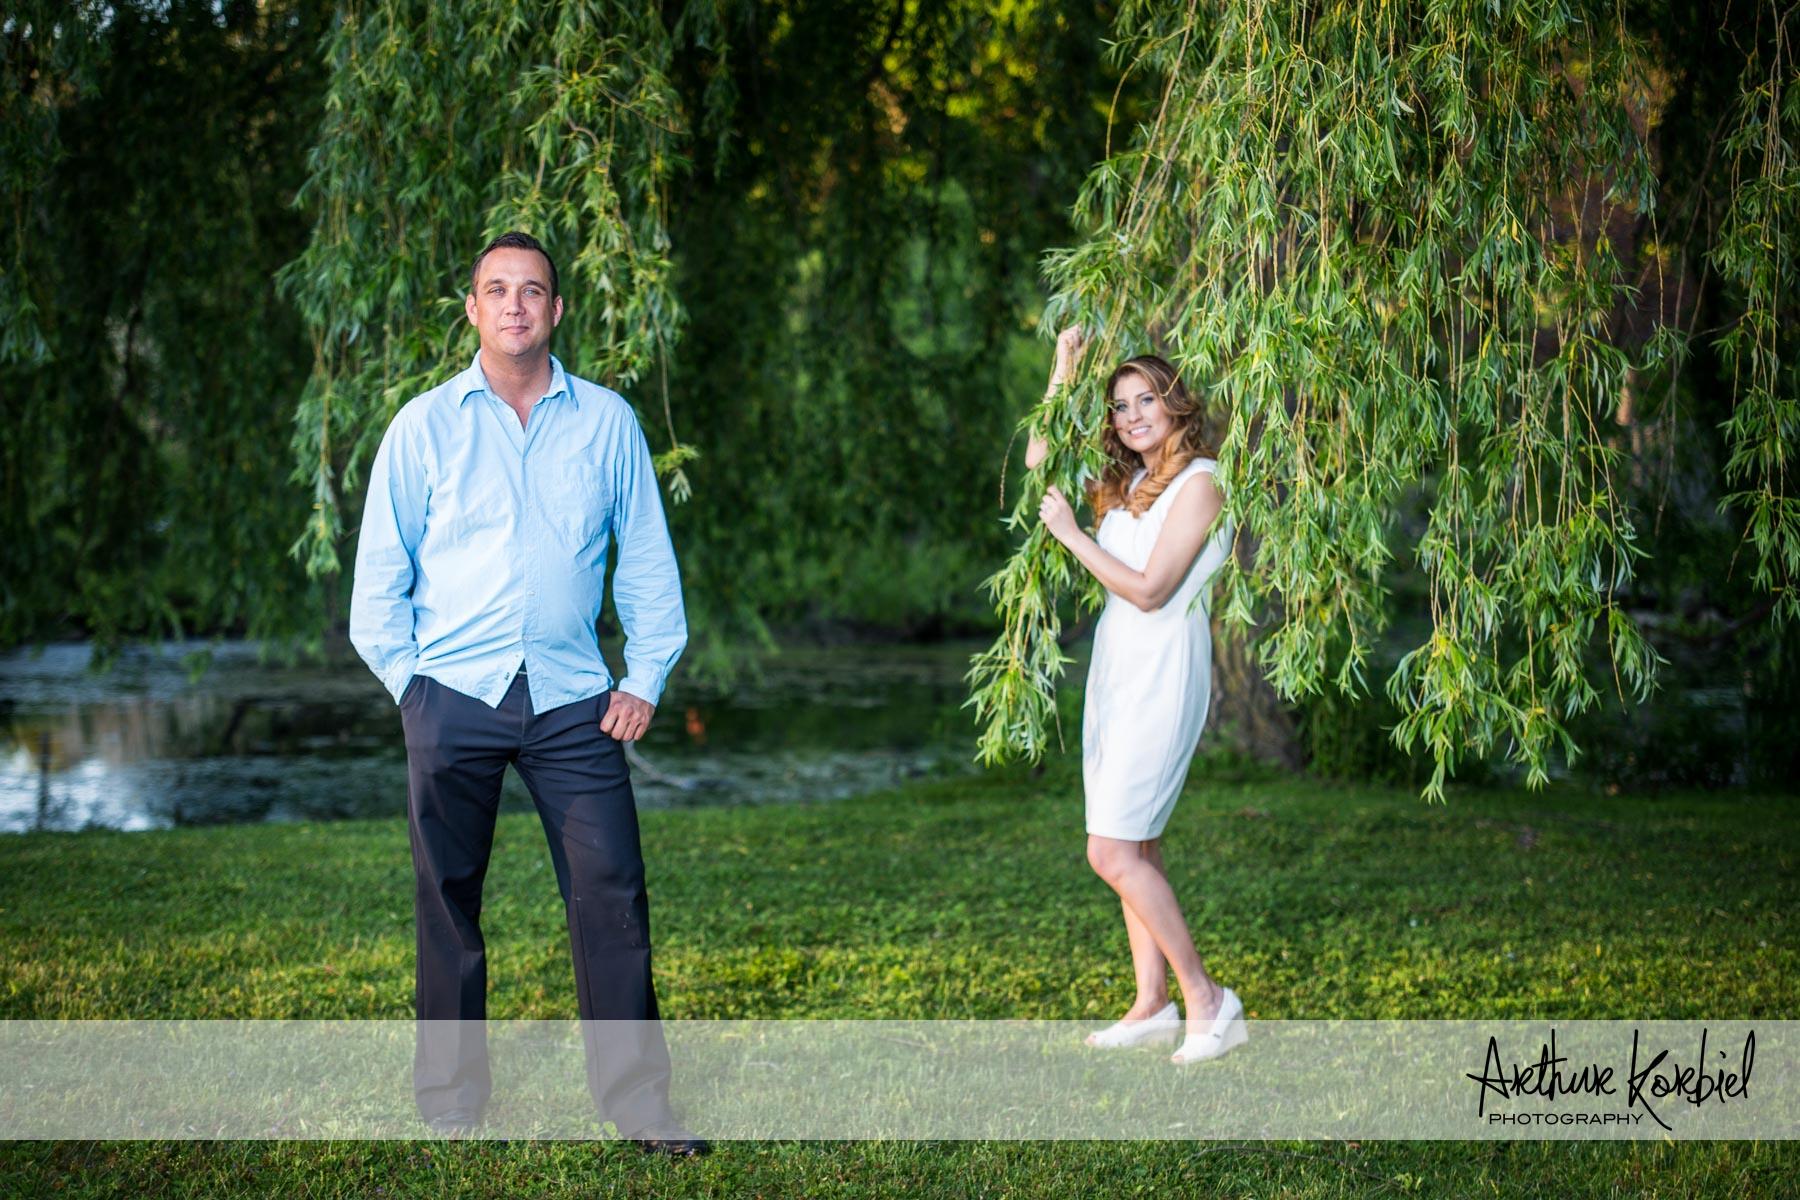 Arthur Korbiel Photography - London Engagement Photographer-032.jpg